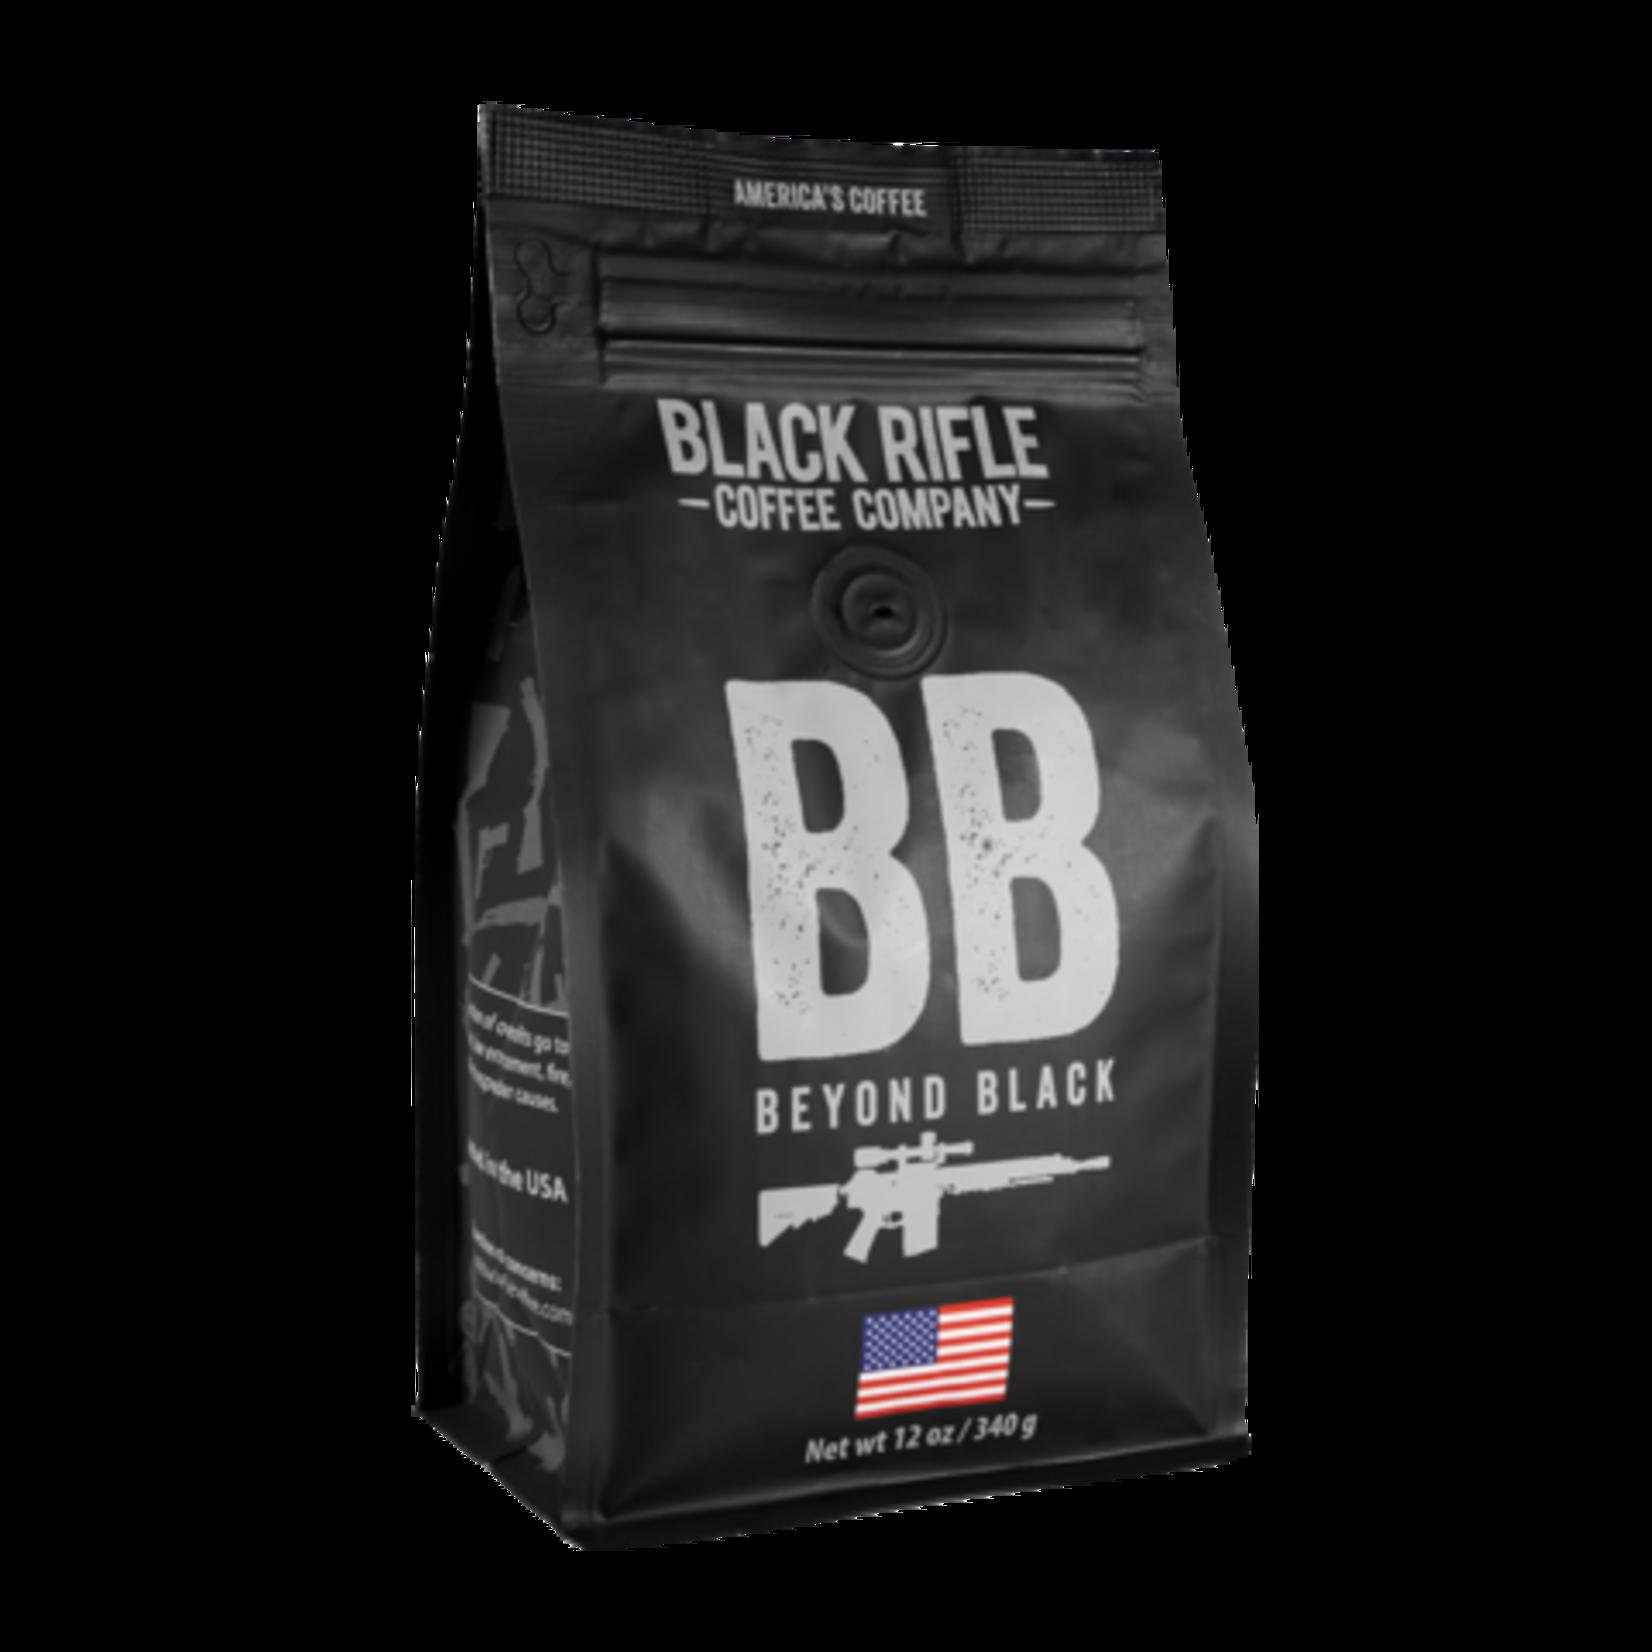 Black Rifle Coffee Black Rifle Coffee -Whole Beans - Beyond Black